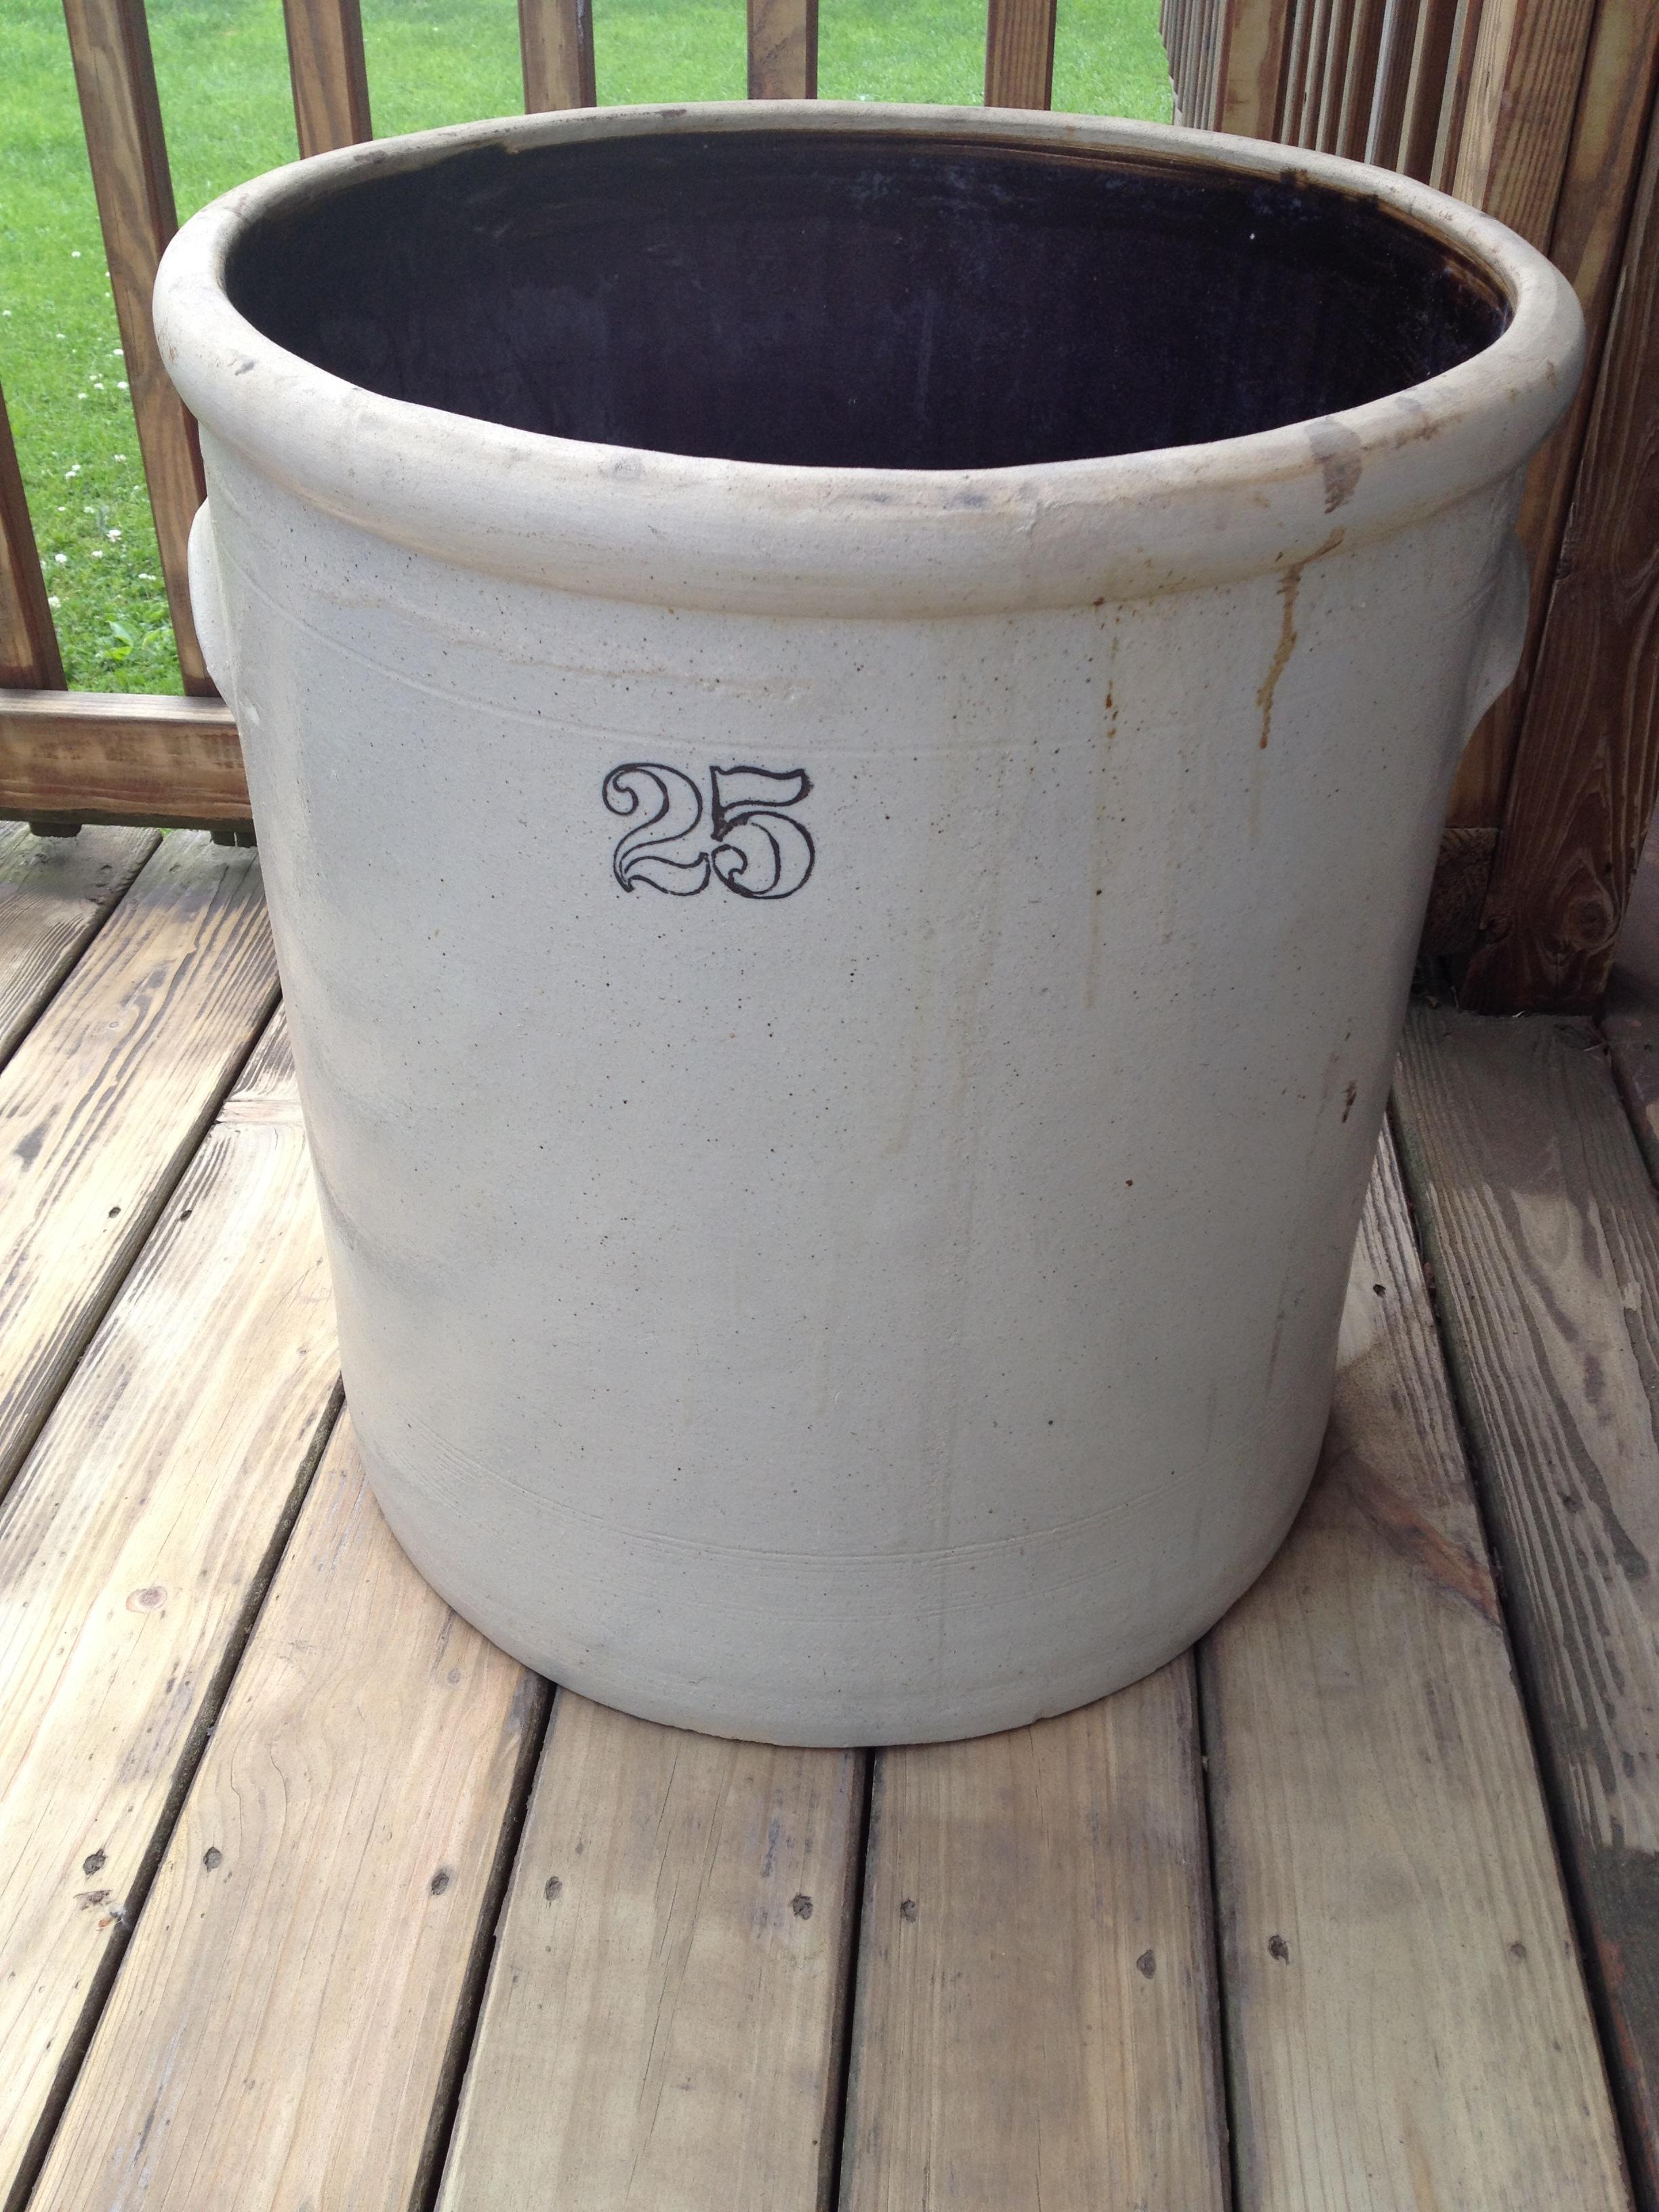 25 Gallon Stoneware Crock Antique Appraisal Instappraisal